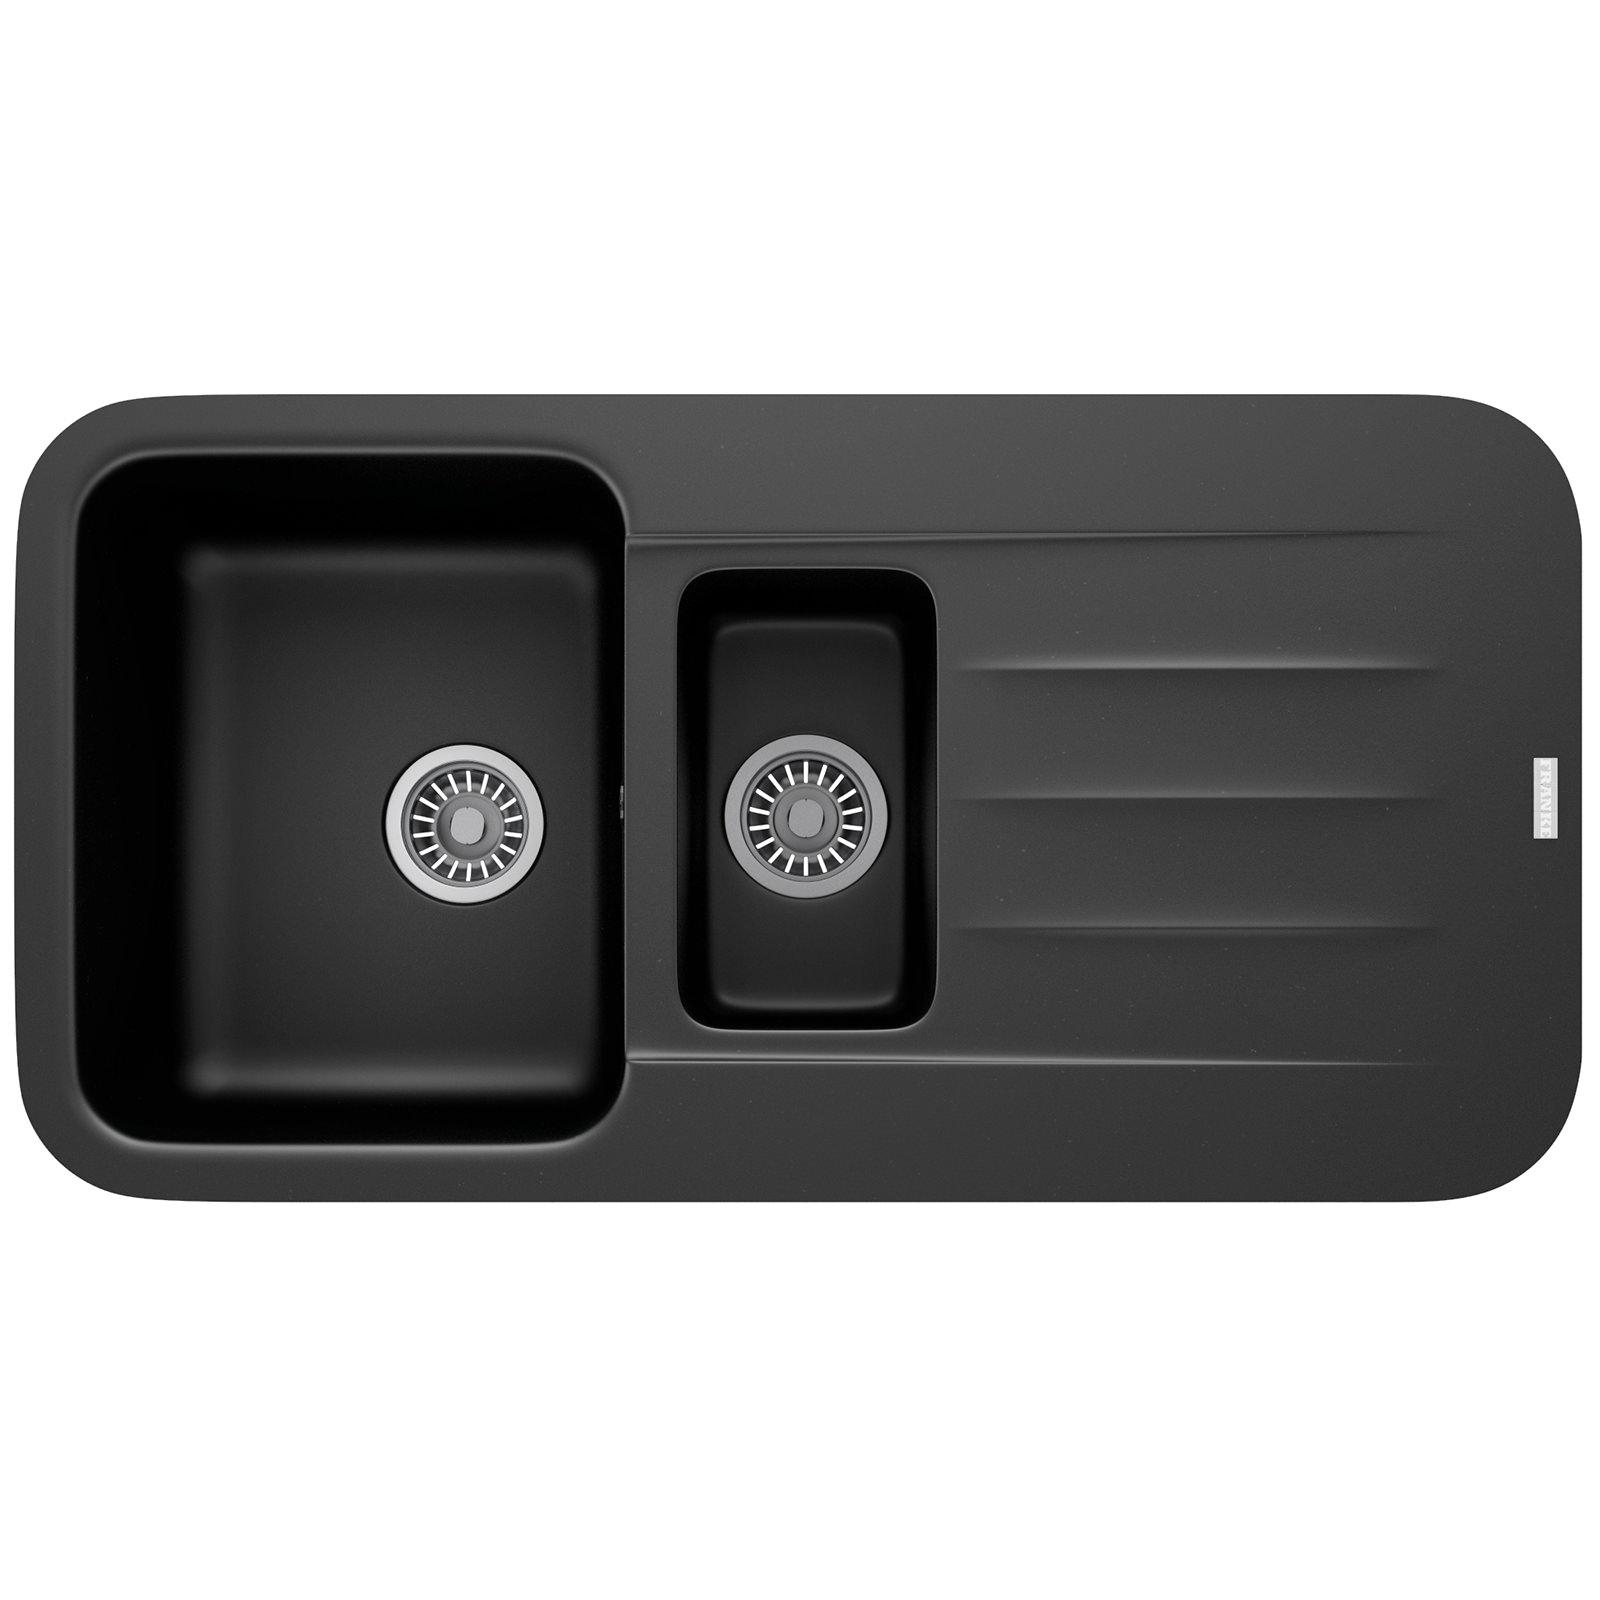 Franke Impact Sink : Franke Pebel PBG 651 Fragranite Onyx 1.5 Bowl Inset Sink 114.0251 ...